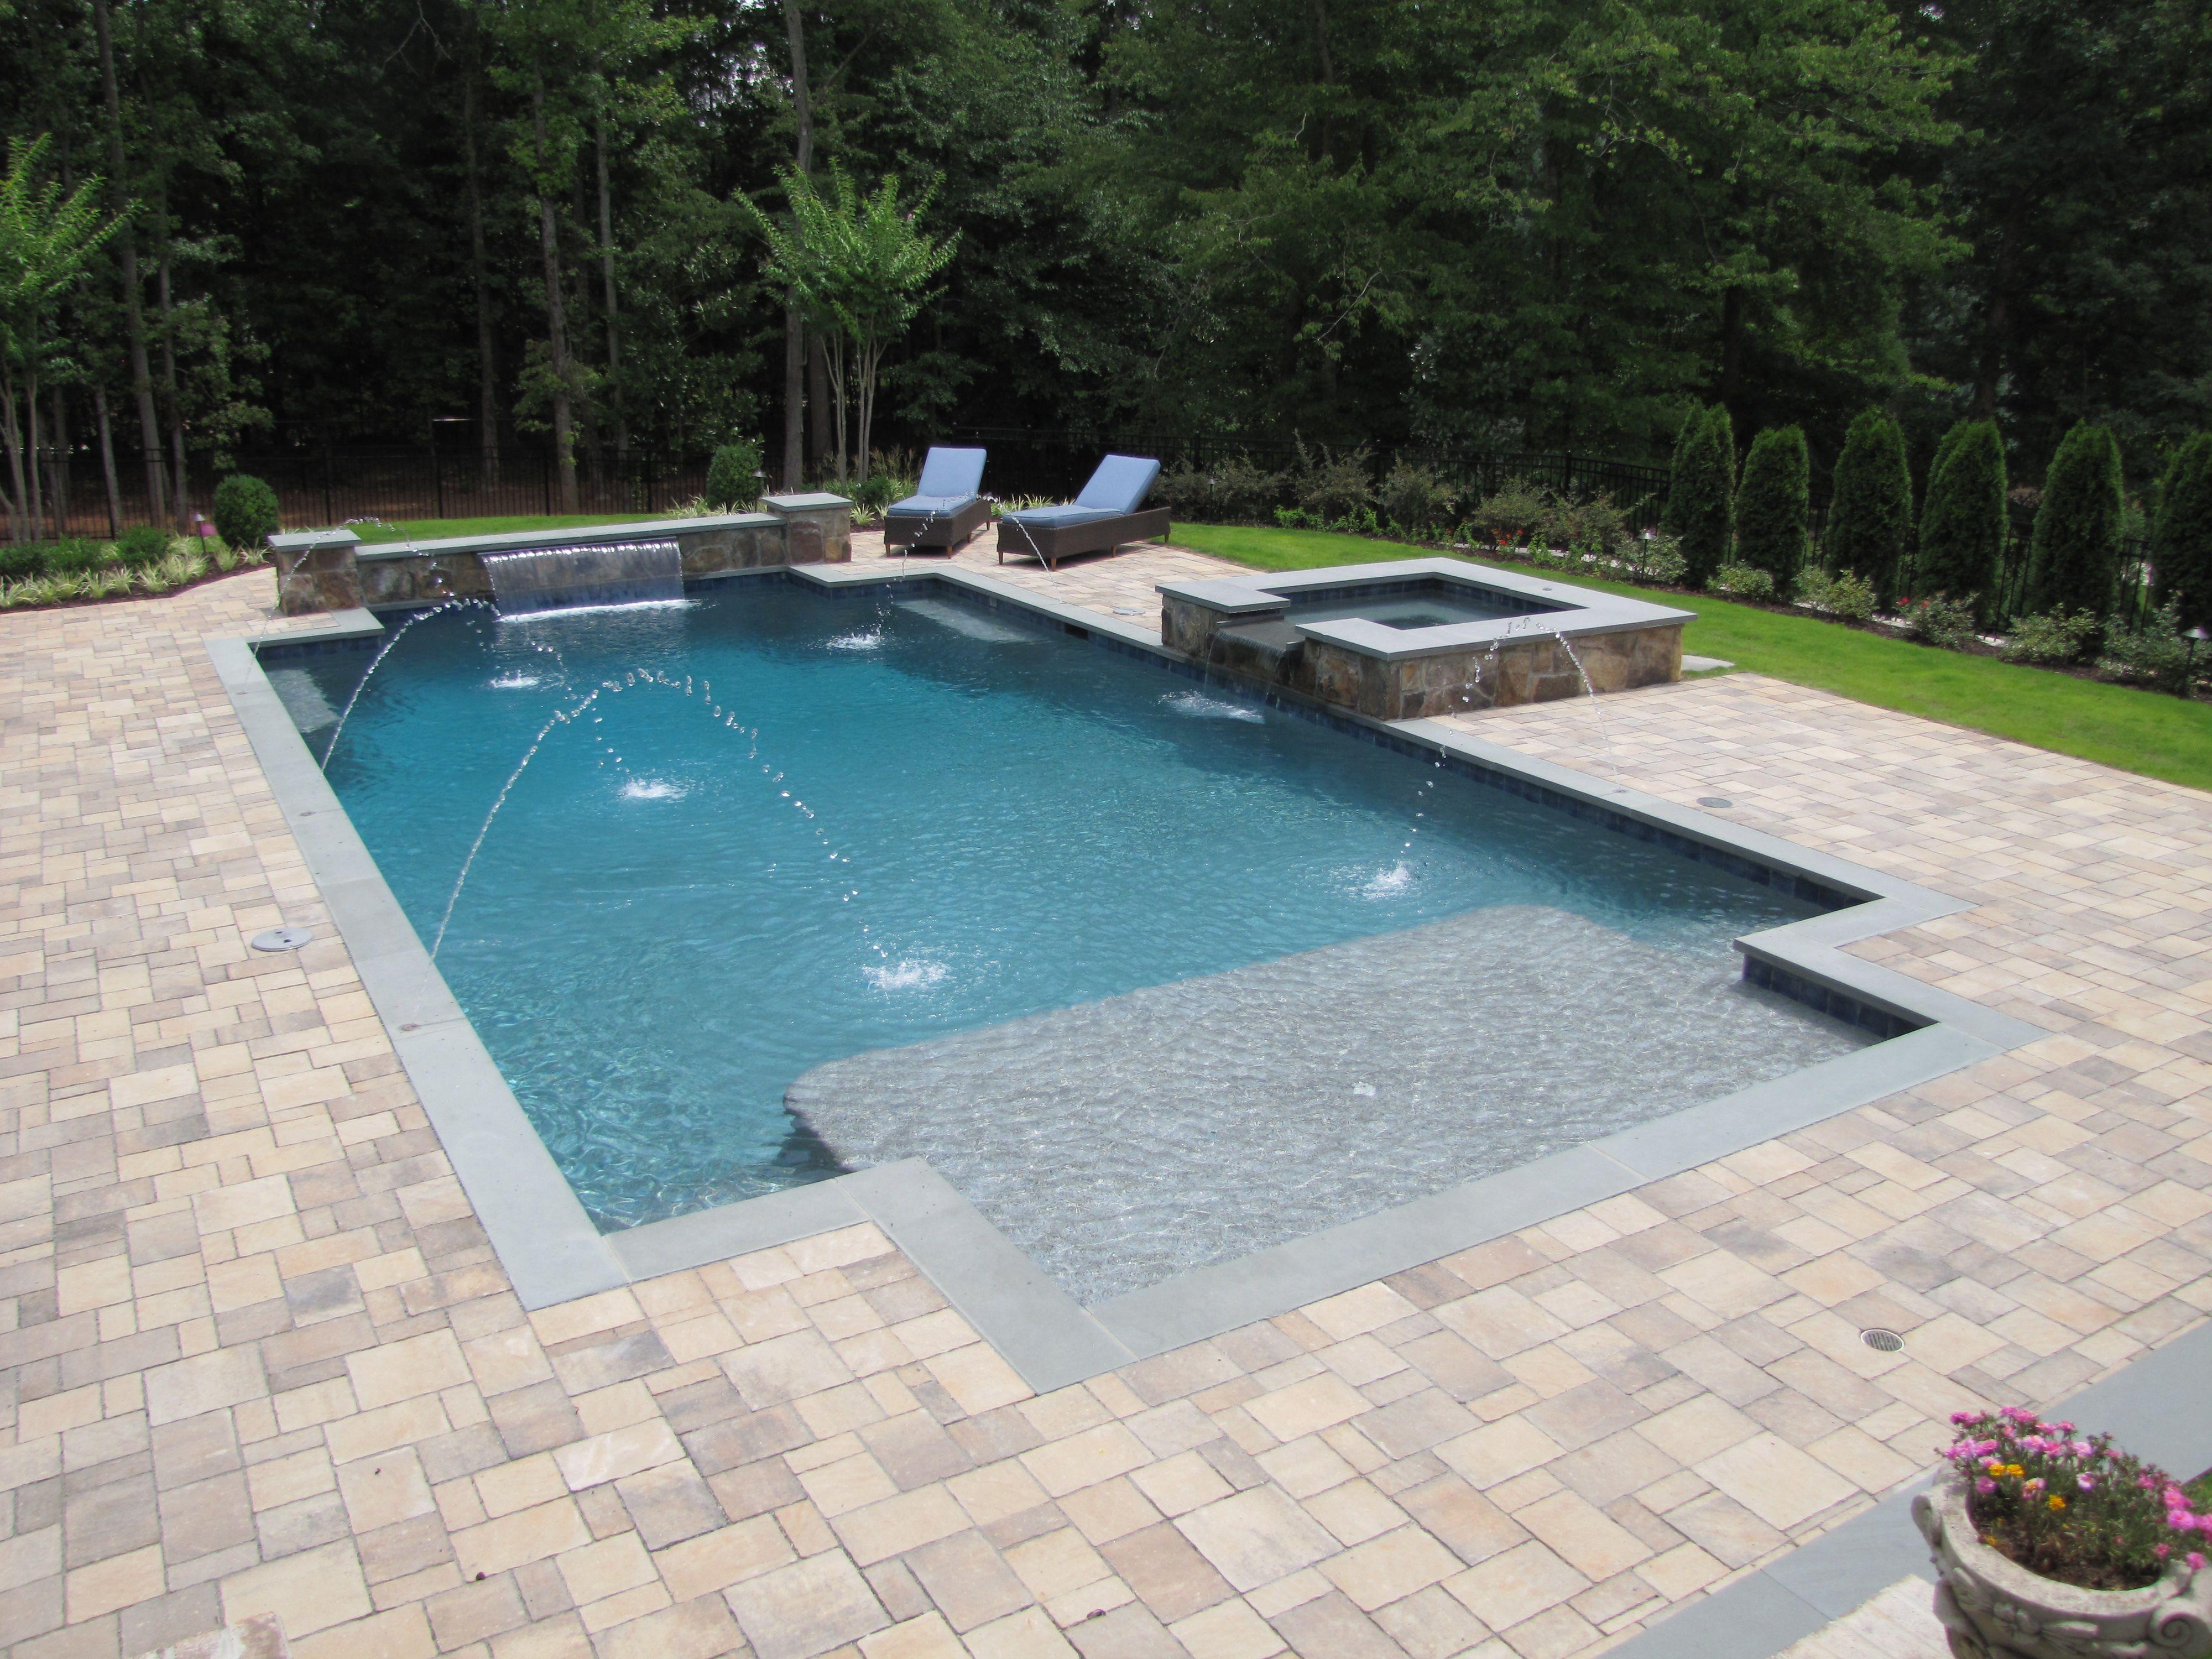 Inground Pool With Spa And Bluestone Coping And Paver Decking Pools Backyard Inground Custom Swimming Pool Luxury Swimming Pools